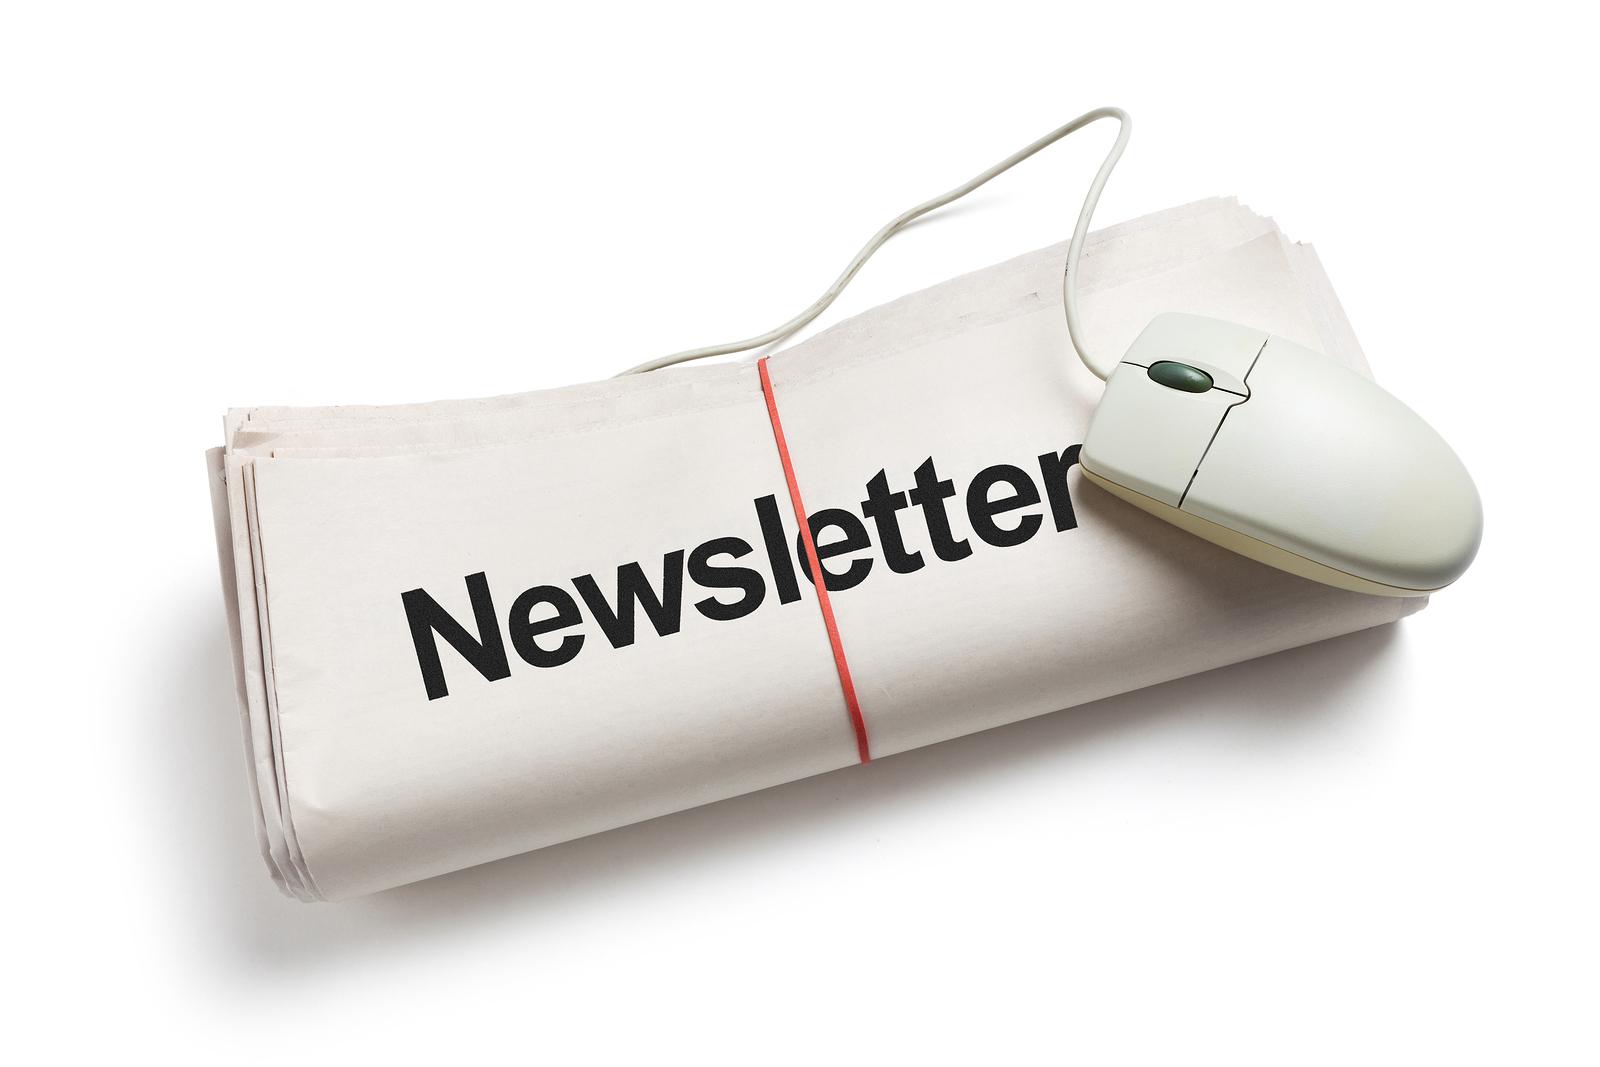 bigstock-Newsletter-32048984